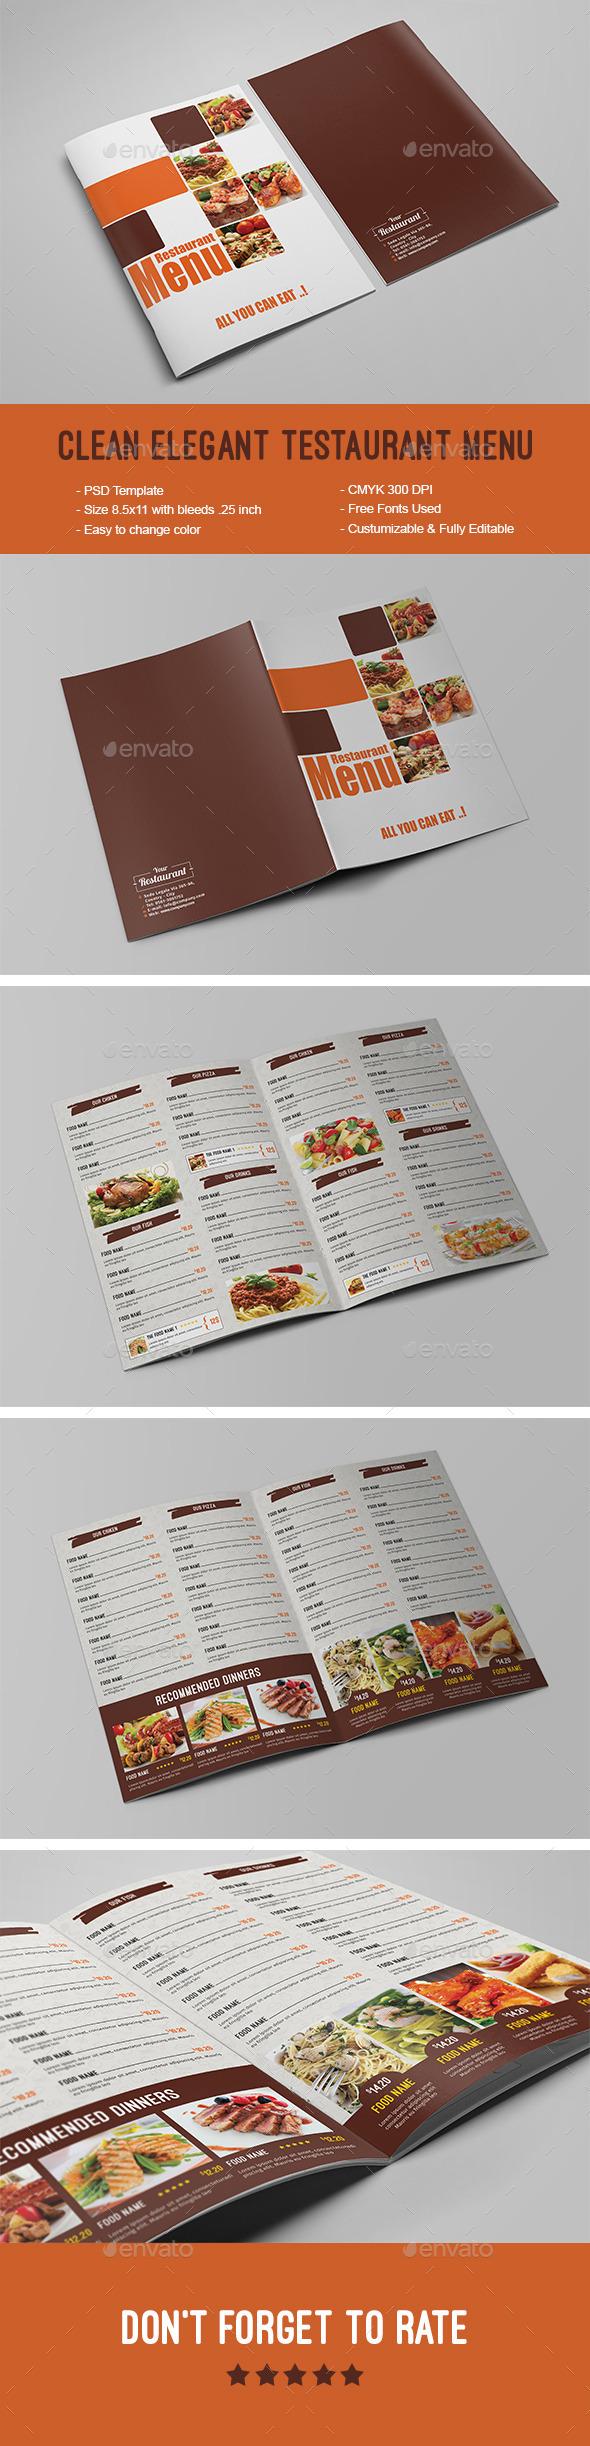 Restaurant Menu Design Graphics Designs Templates